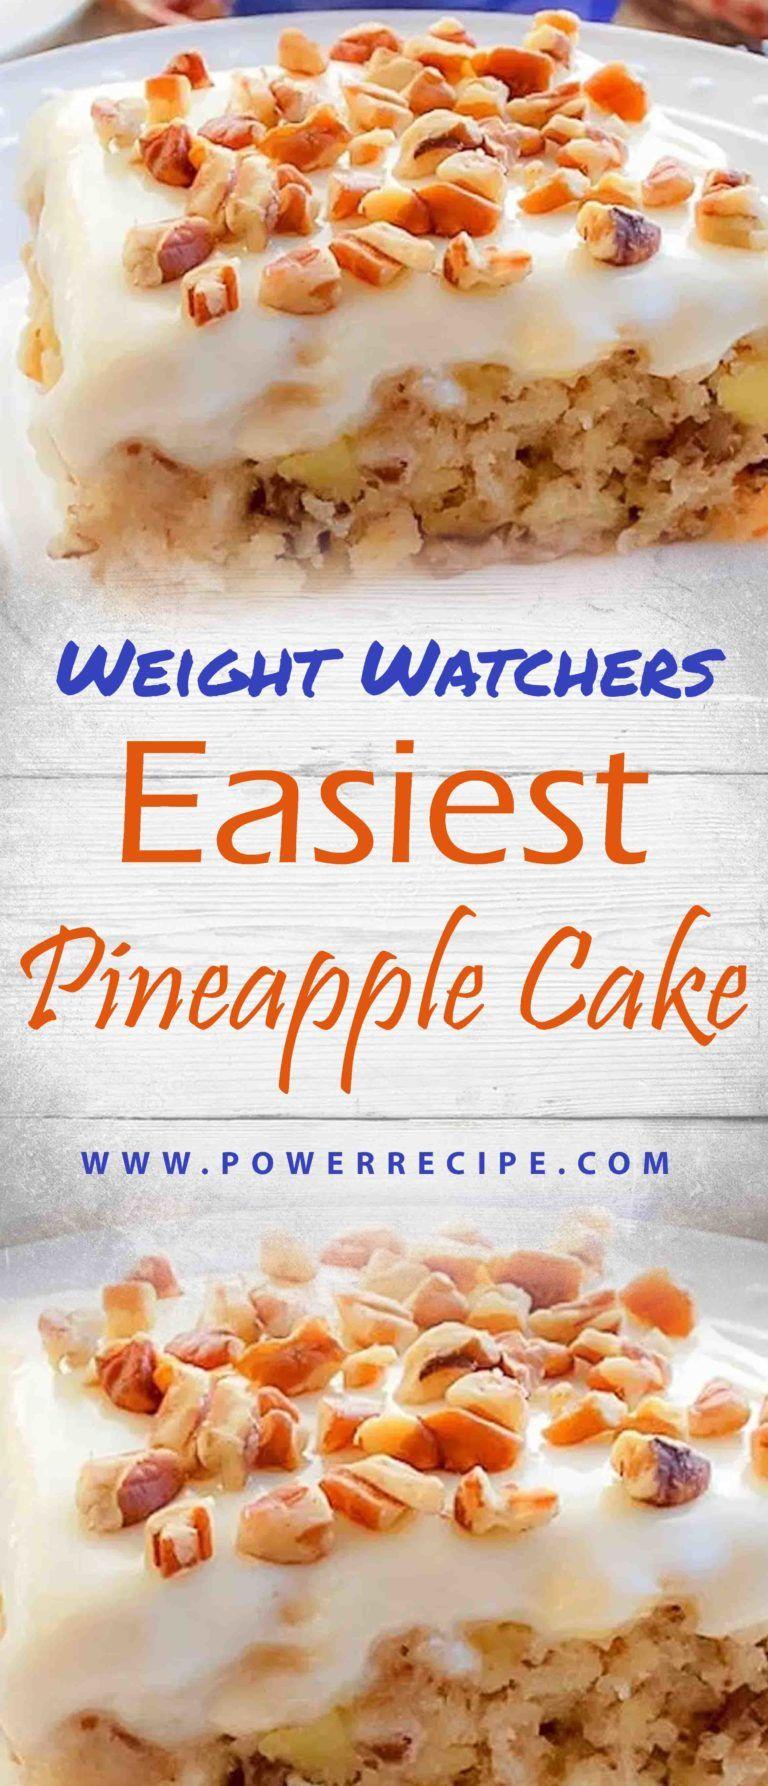 Easiest pineapple cake easy pineapple cake pineapple